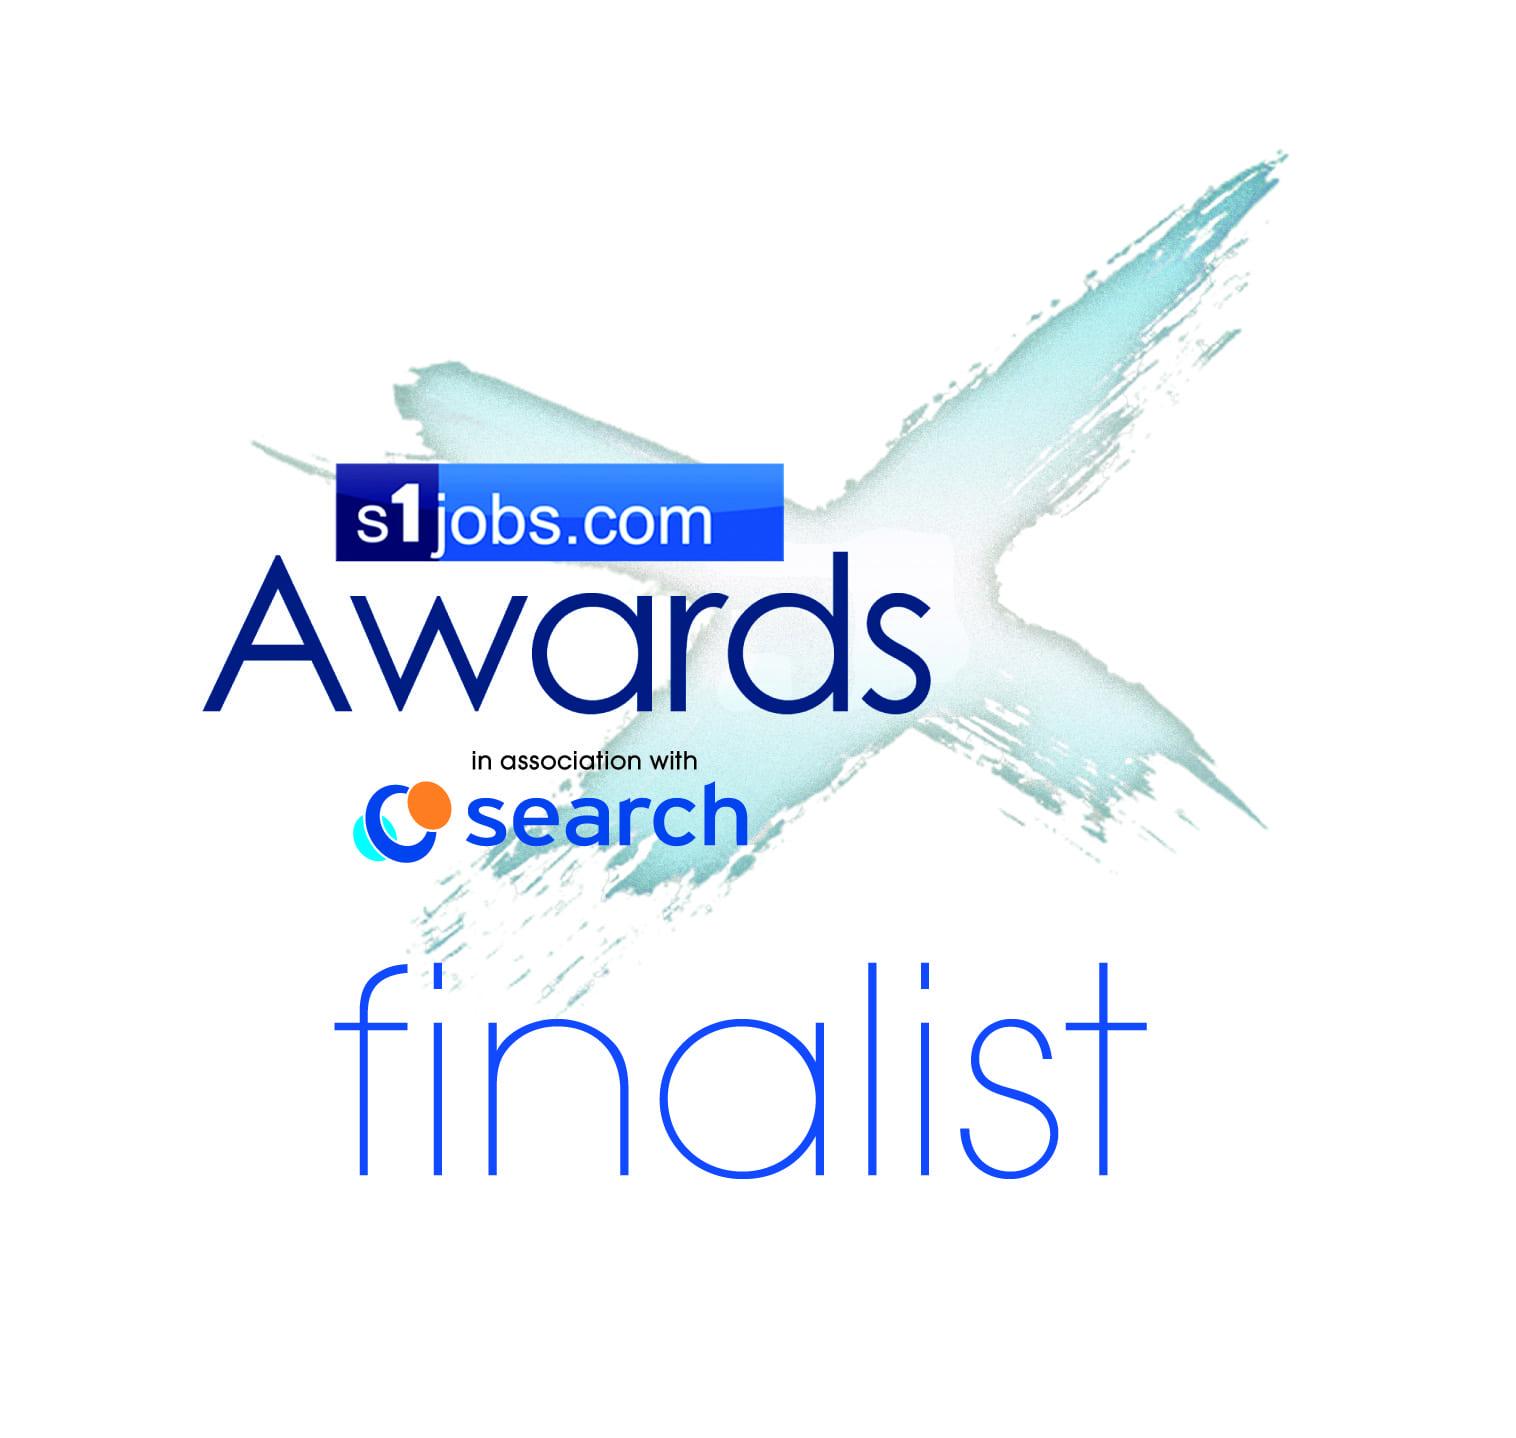 S1 job awards